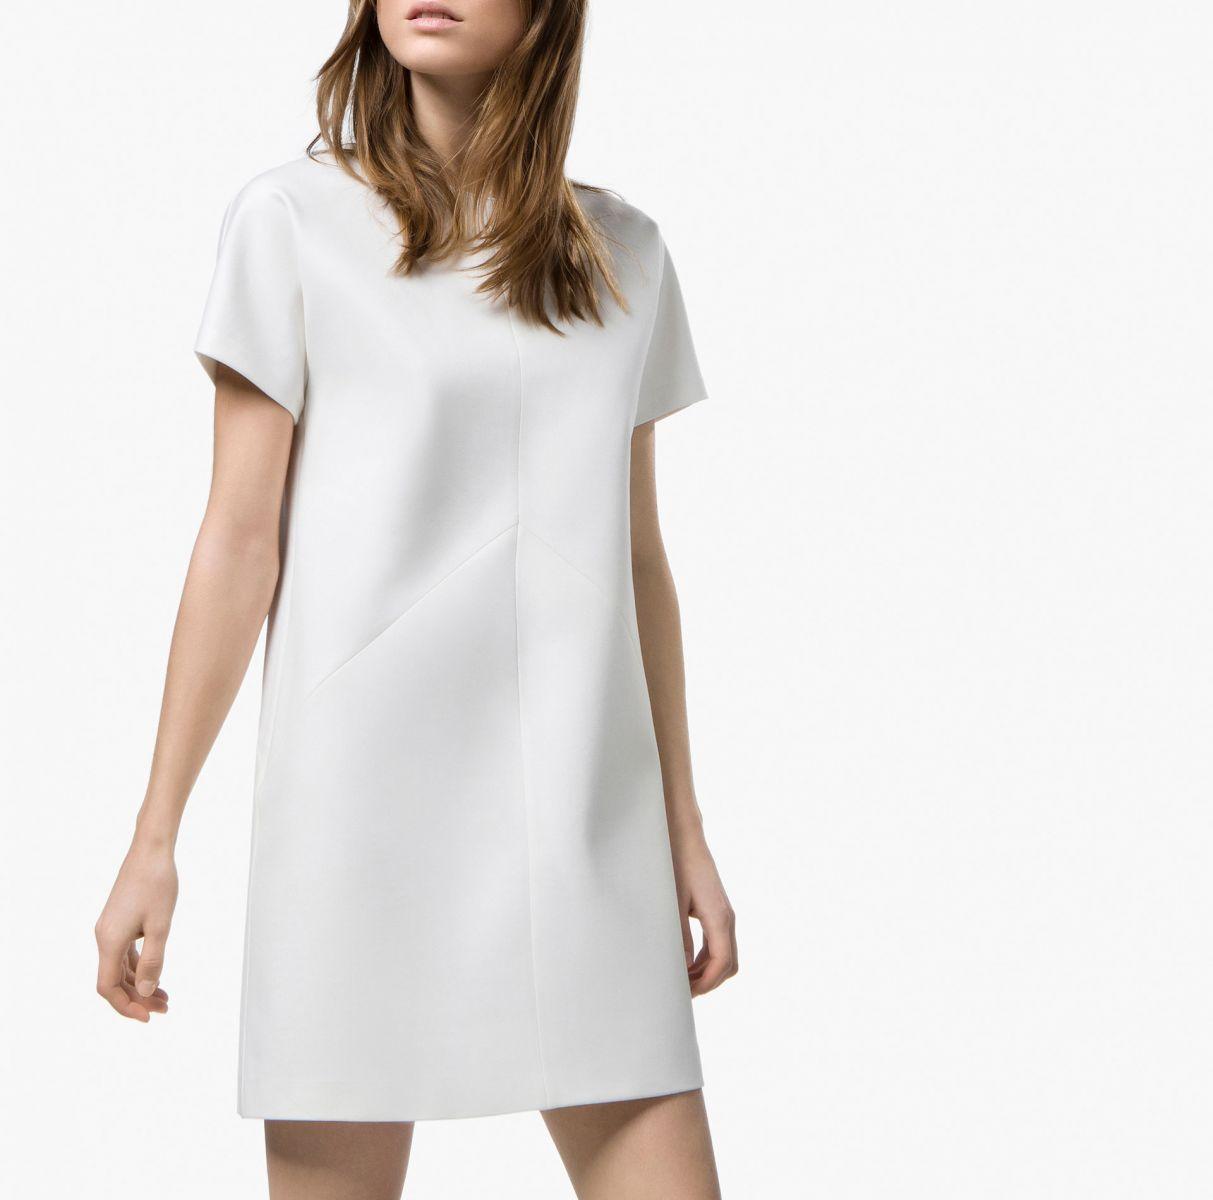 collection printemps t 2016 zara femme guide boutiques de mode guide shopping mode. Black Bedroom Furniture Sets. Home Design Ideas